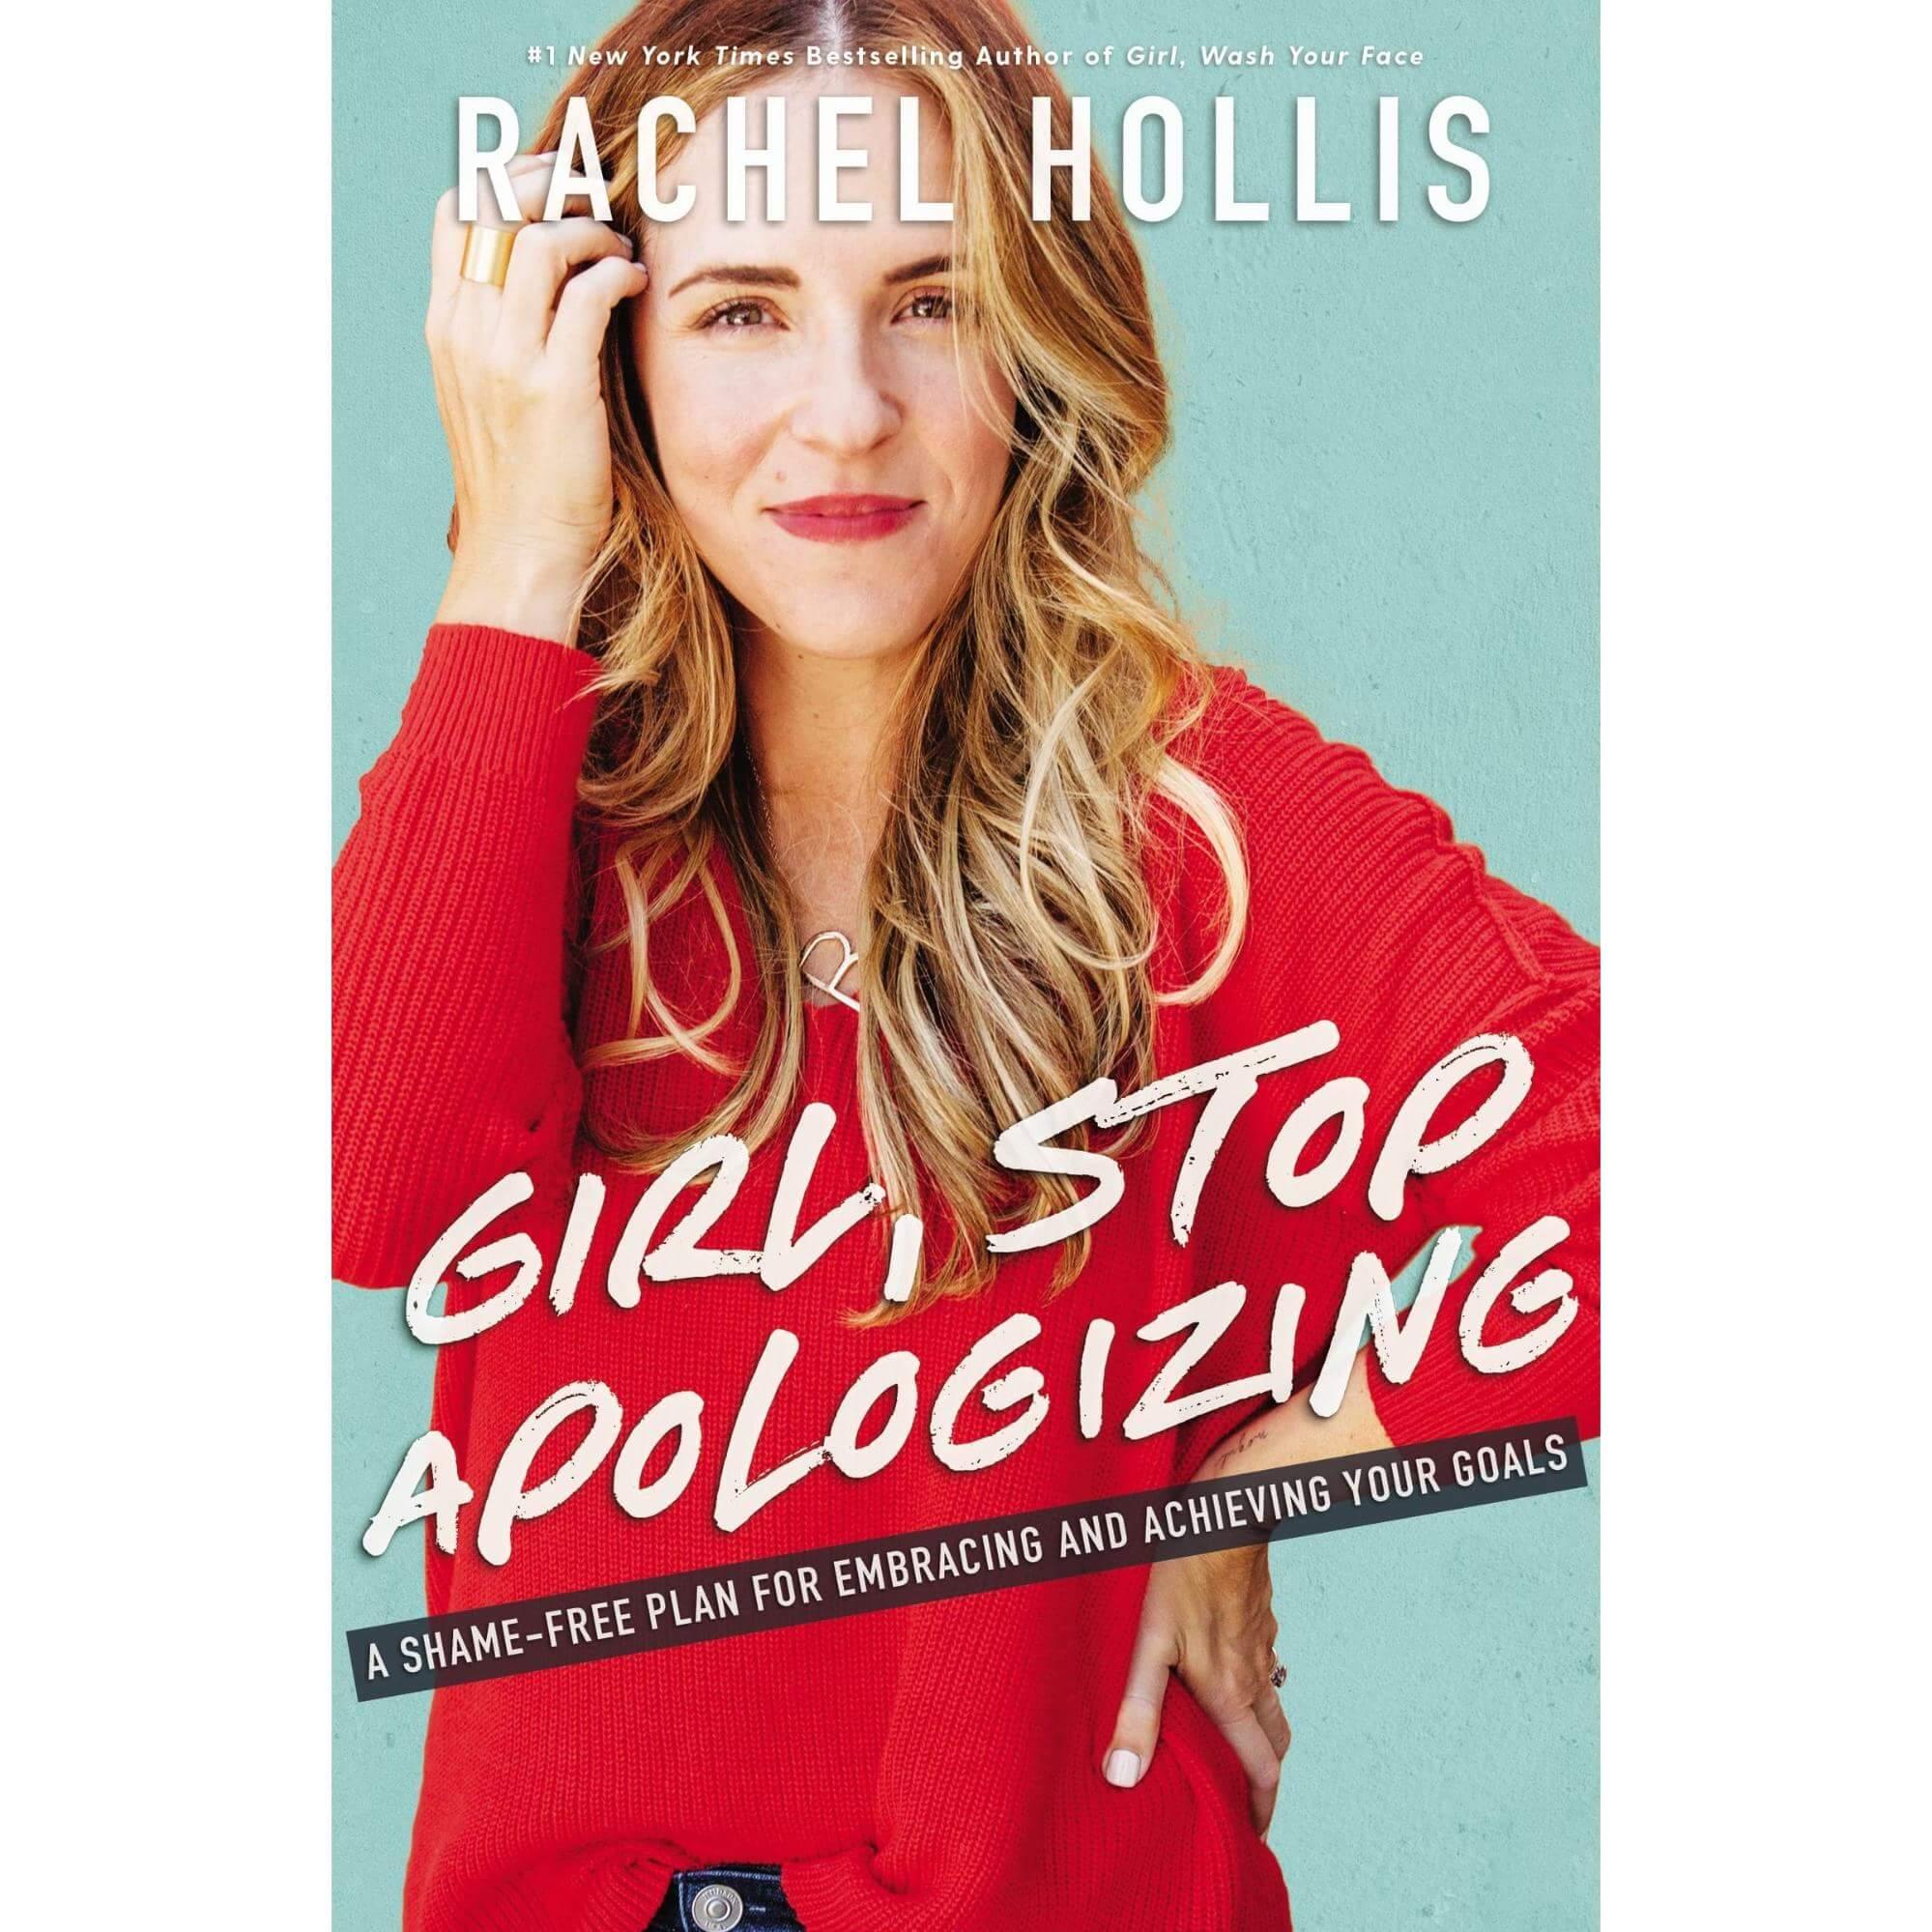 book: Girl, Stop Apologizing by Rachel Hollis